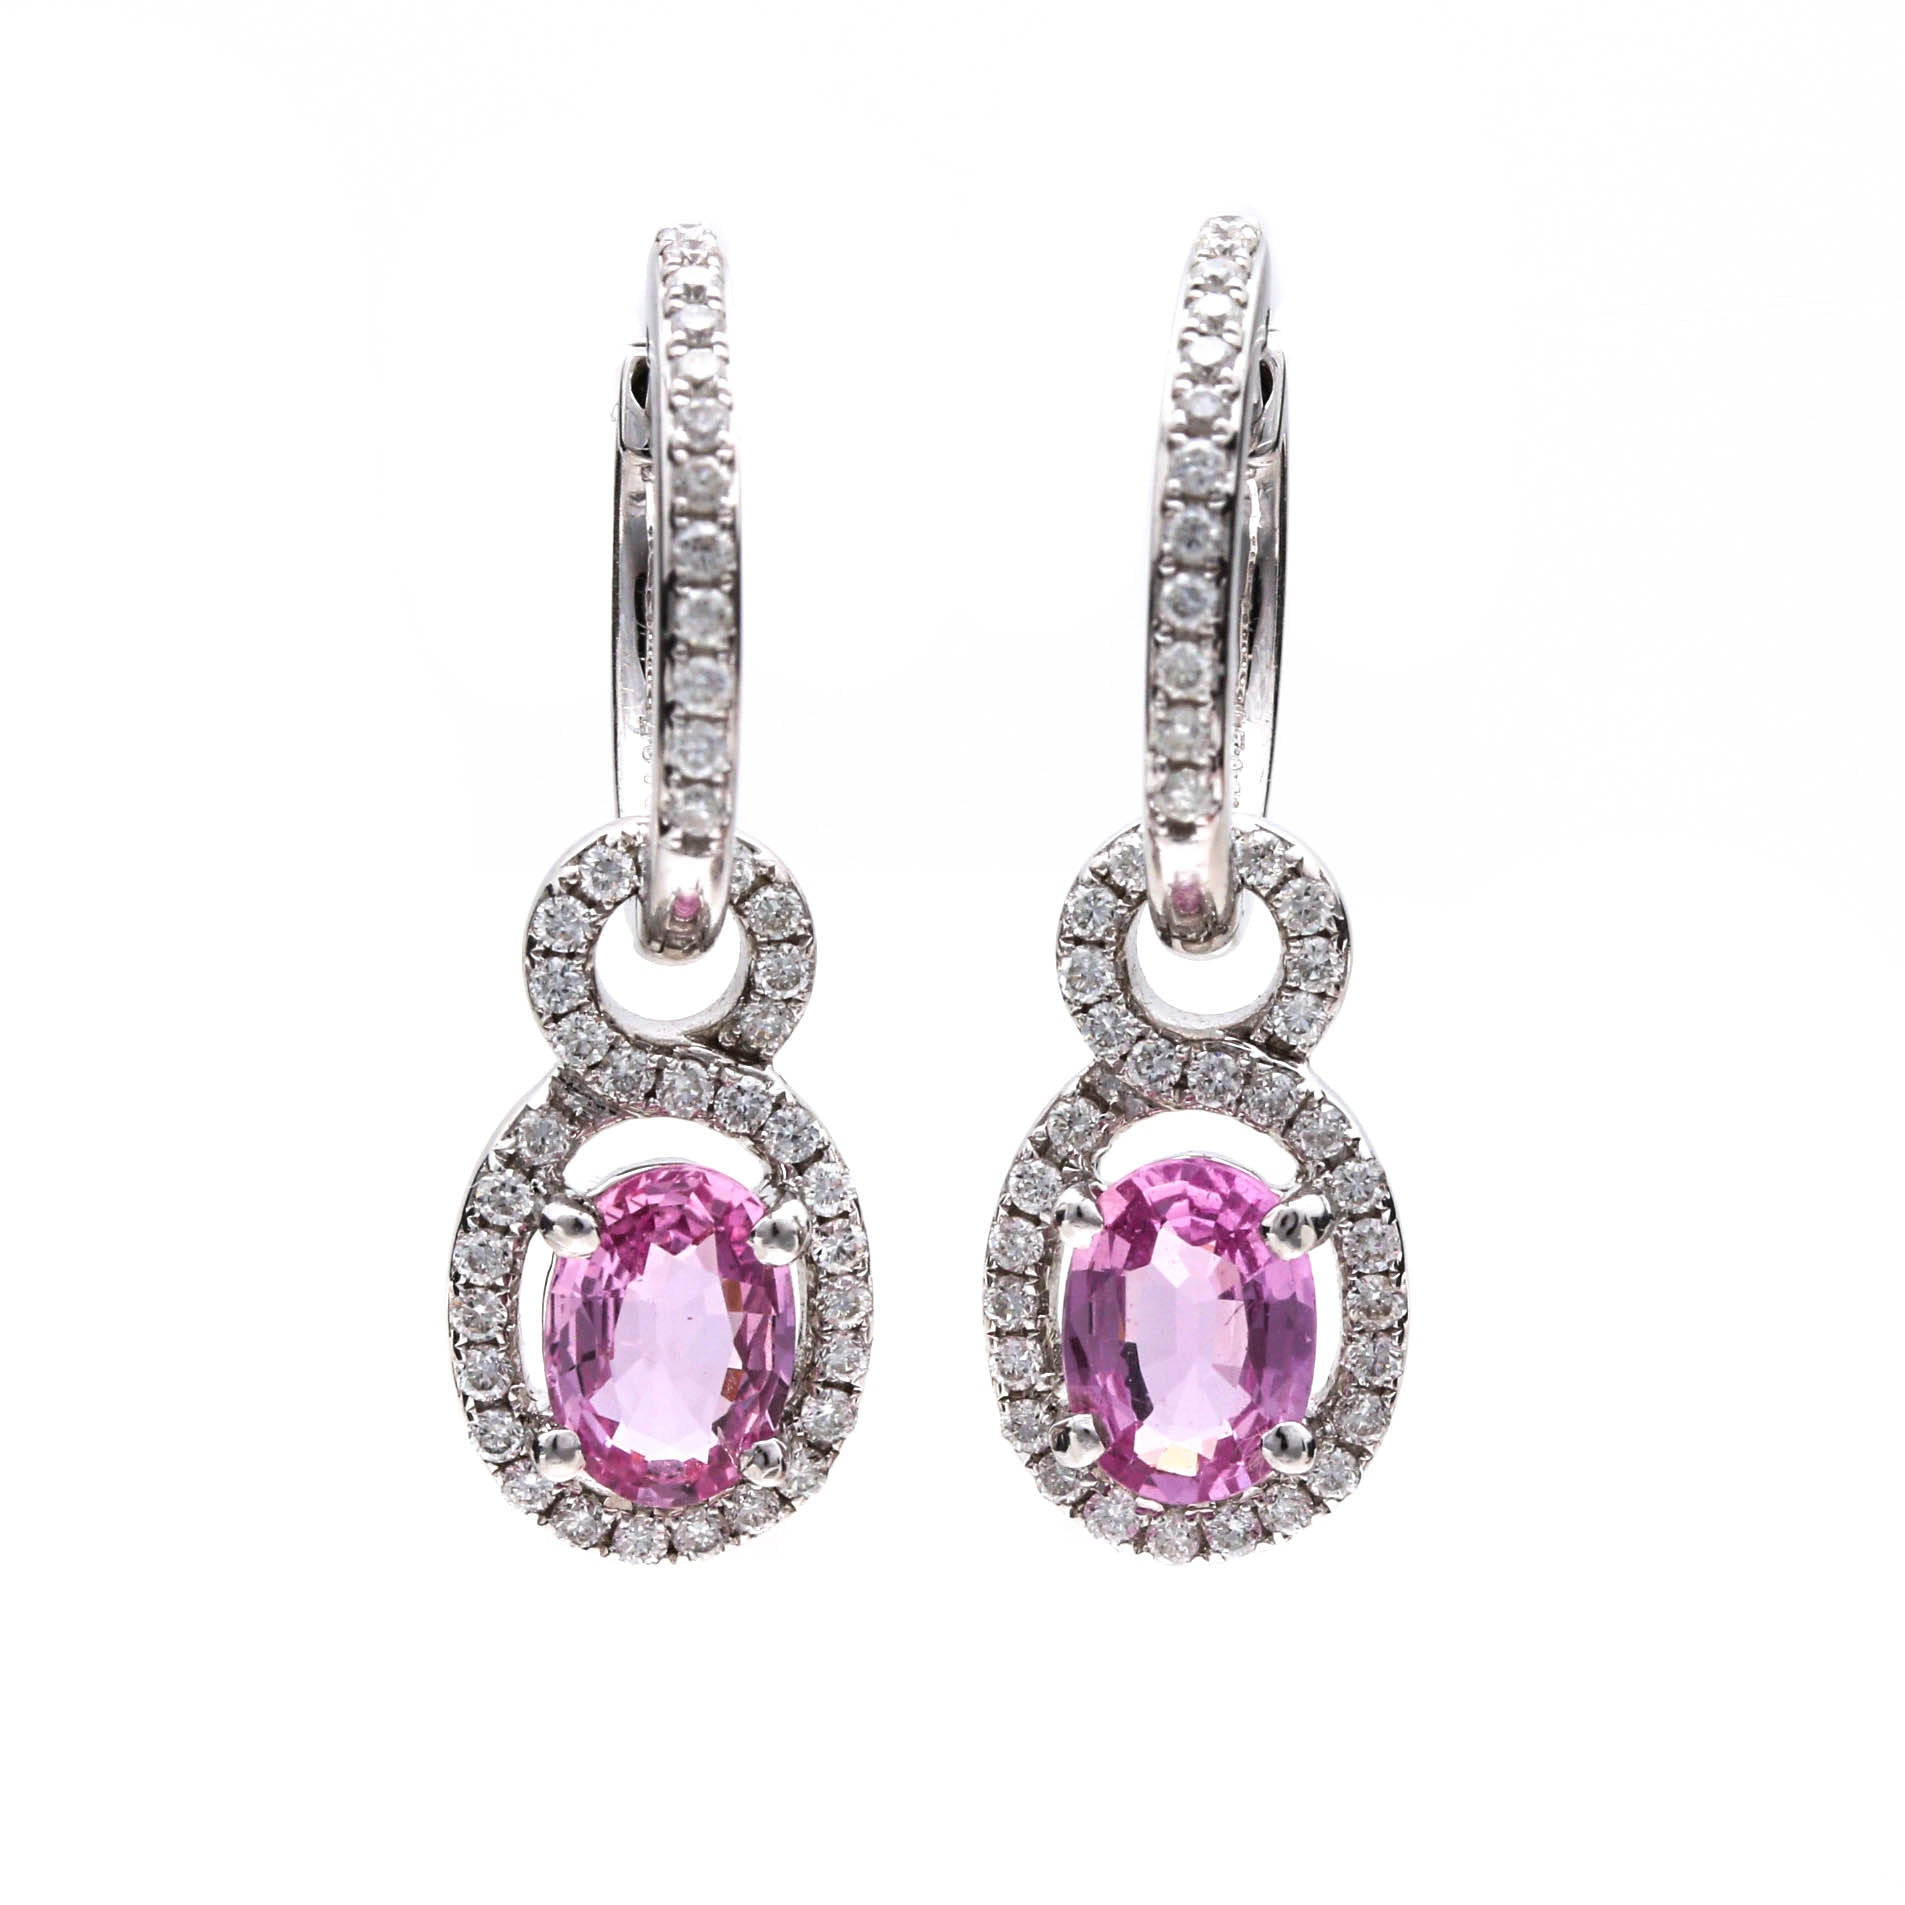 18K White Gold Pink Sapphire and Diamond Dangle Earrings